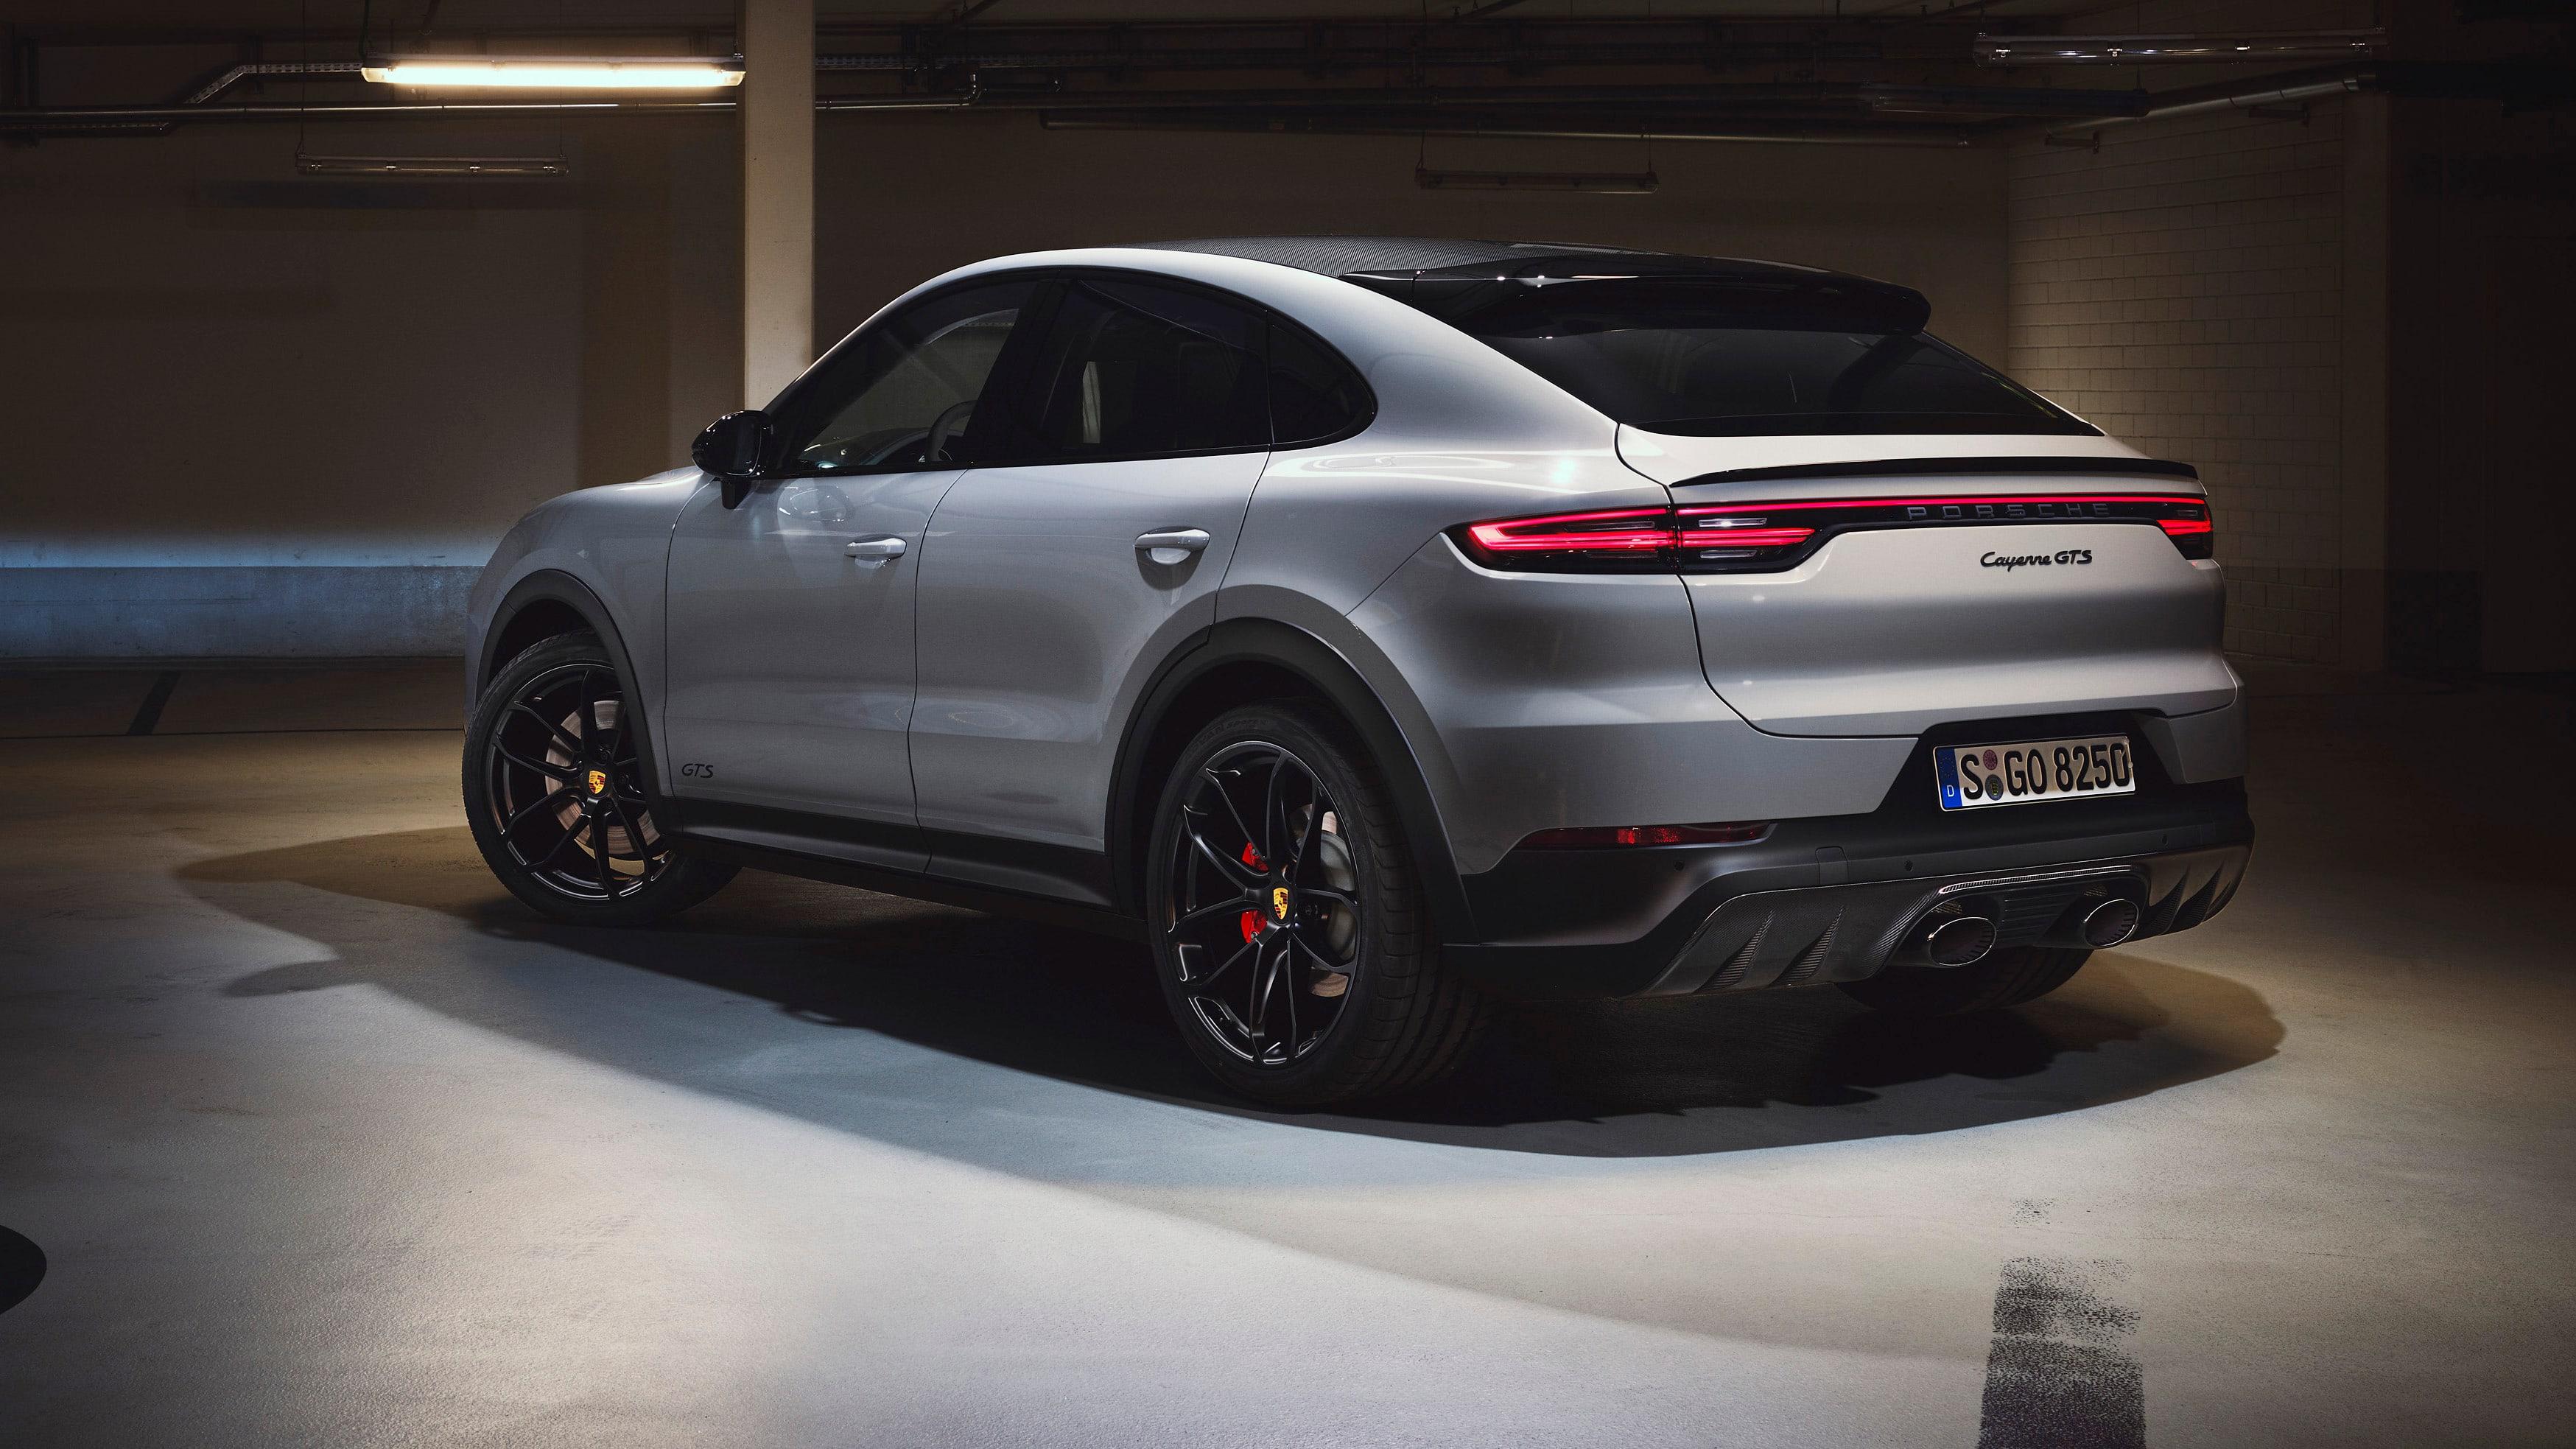 2020 Porsche Cayenne Gts V8 Price And Specs Caradvice